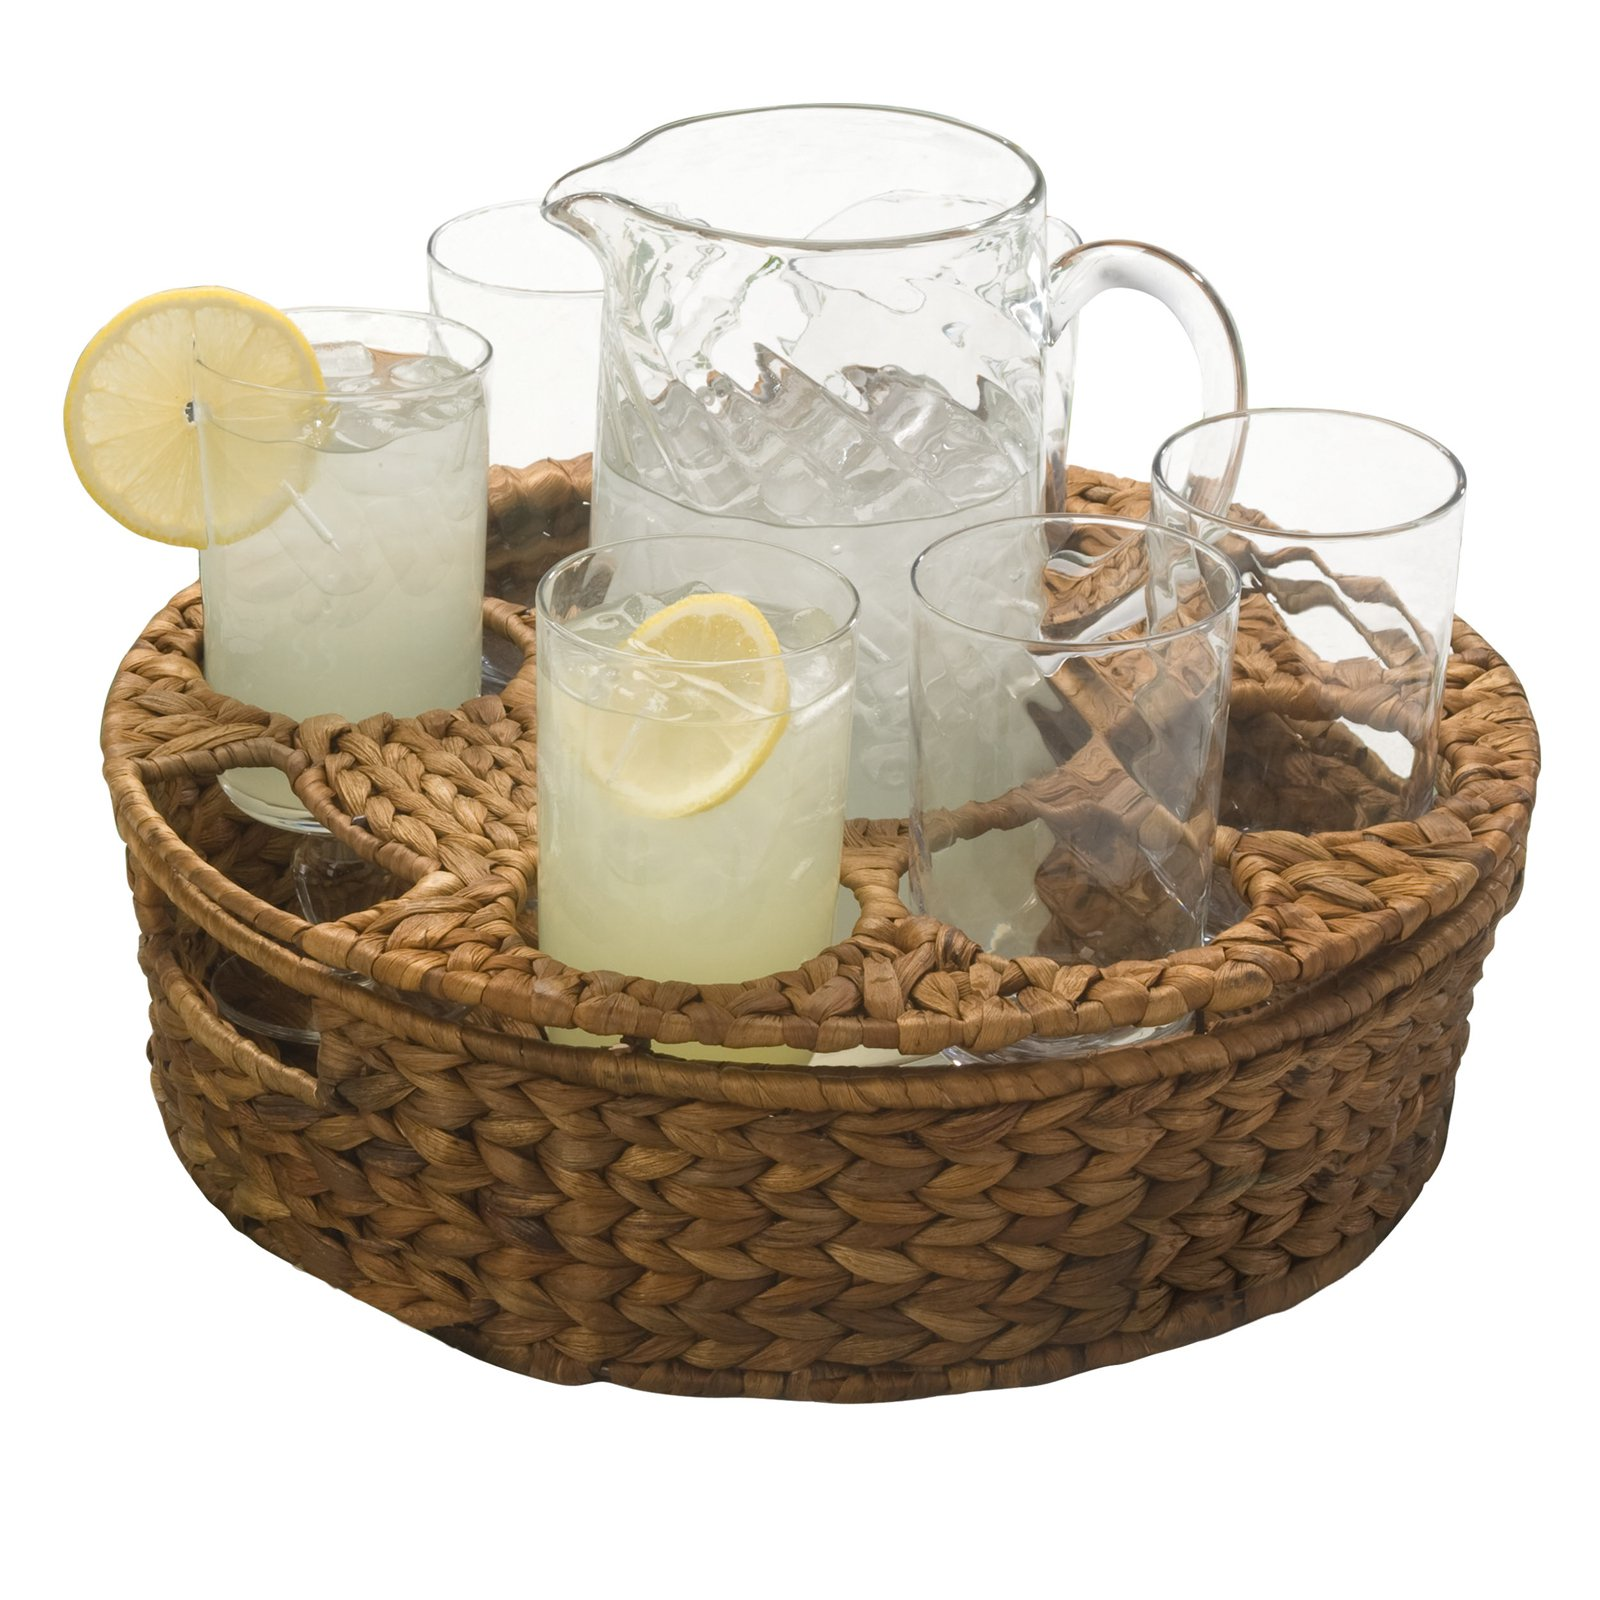 Artland Inc Garden Terrace Beverage Set with Pitcher